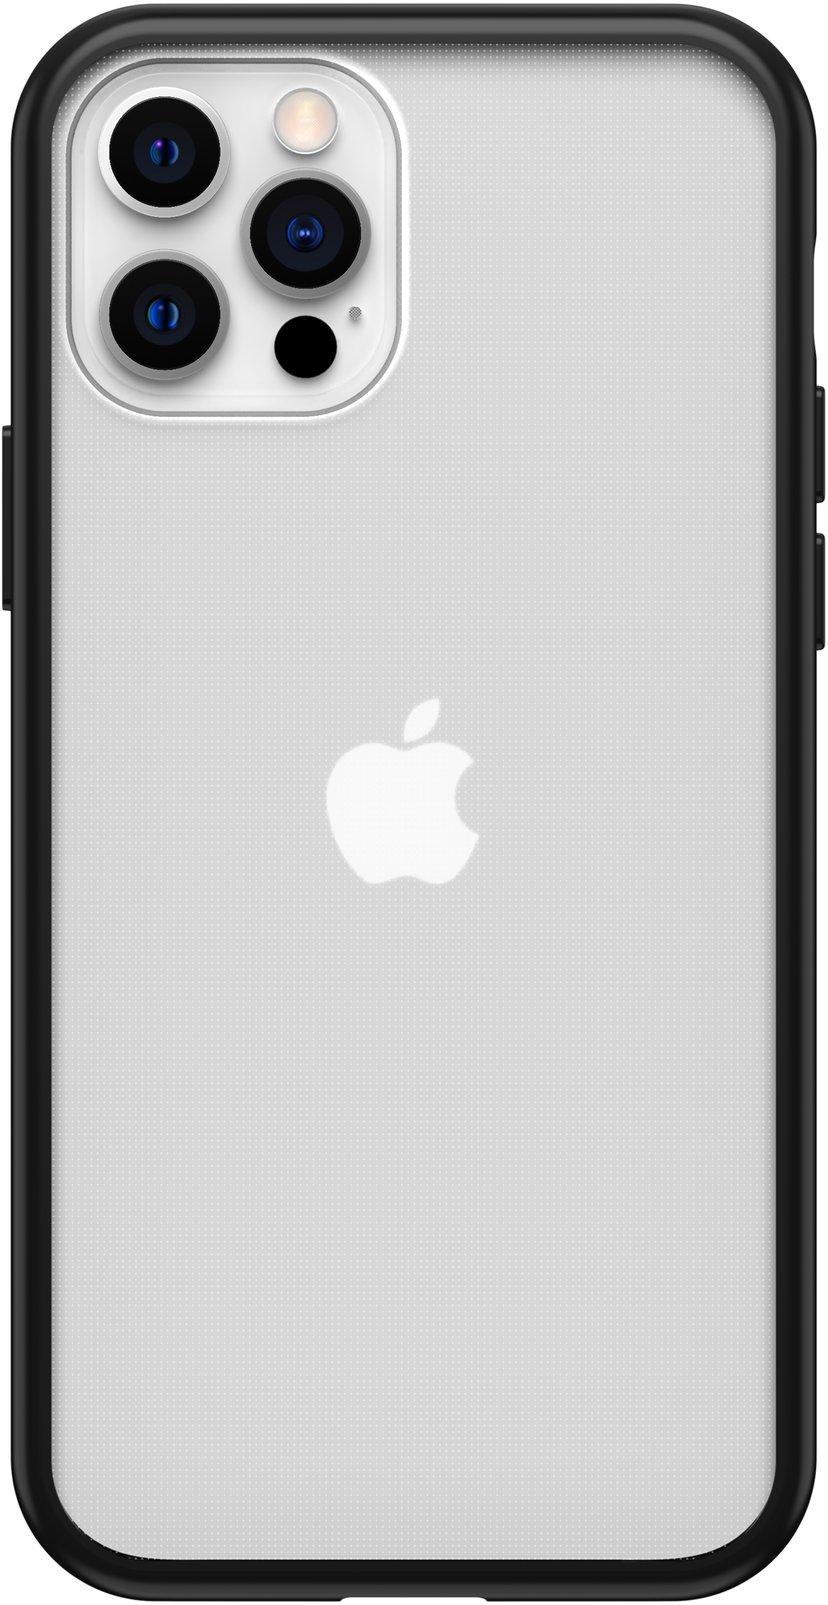 Otterbox OtterBox React Series iPhone 12, iPhone 12 Pro Svart krystall